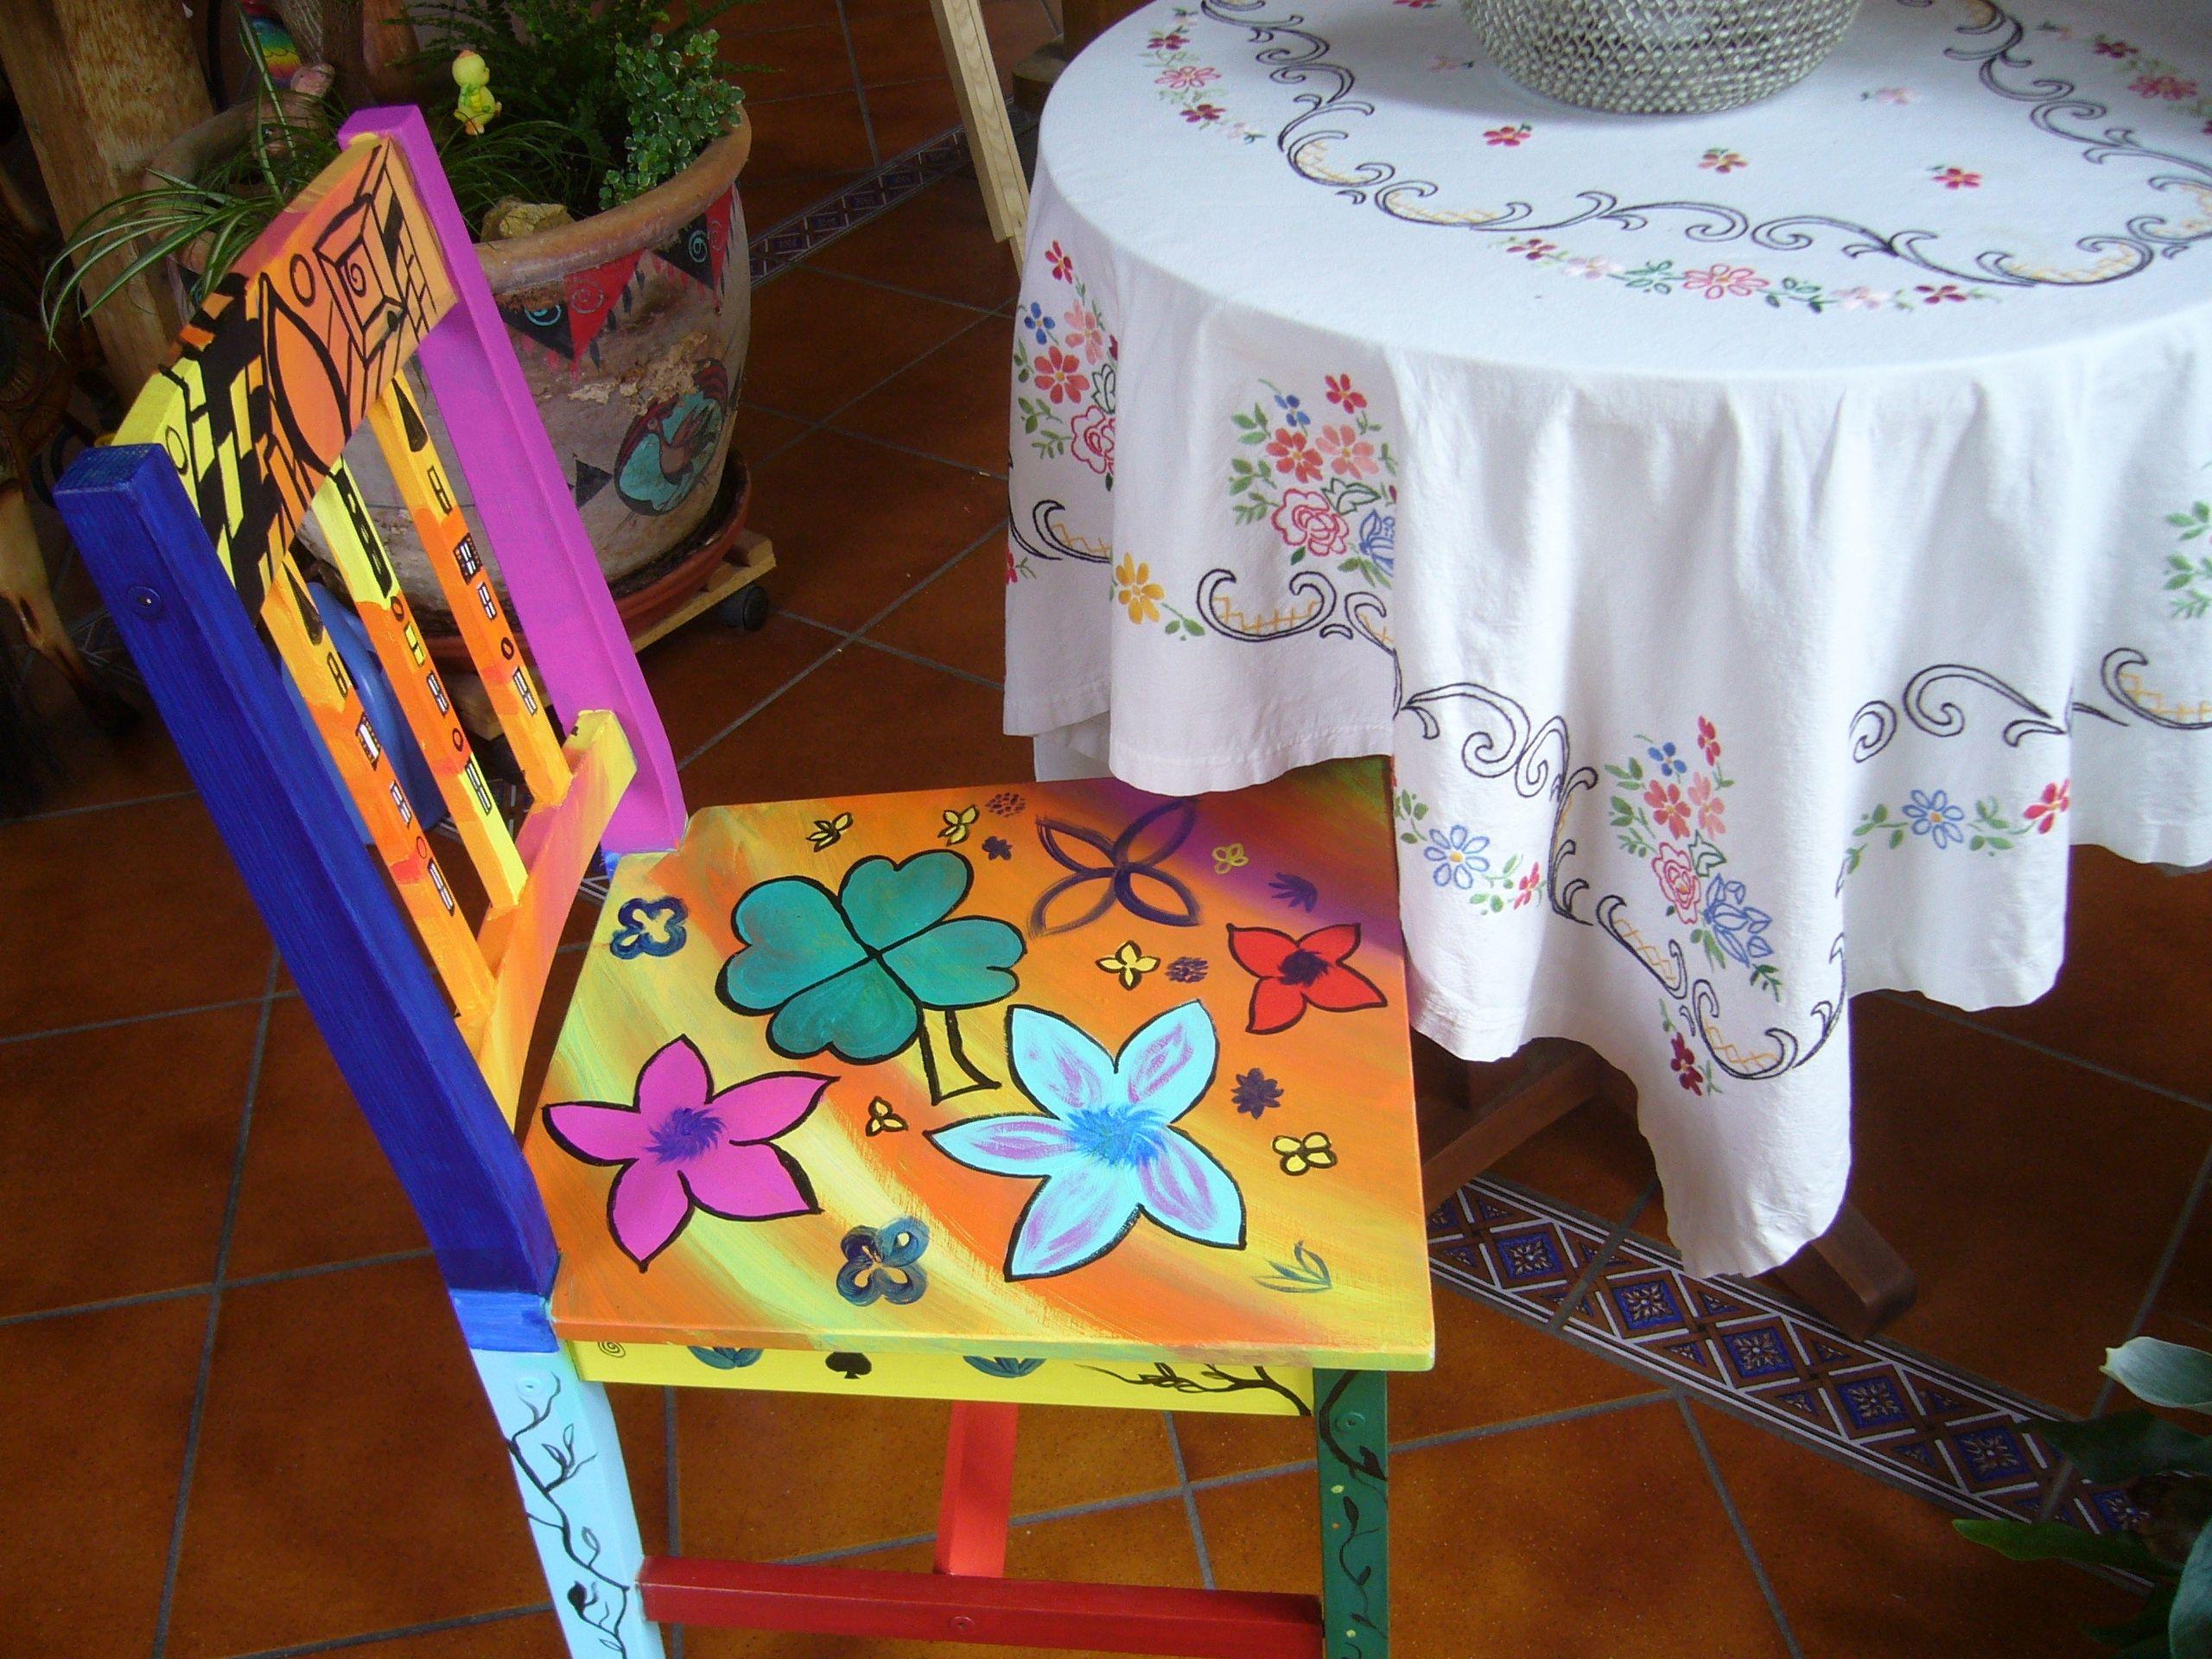 Alter Stuhl Bemalt Mit Acrylfarben Alte Stuhle Stuhle Acrylfarbe